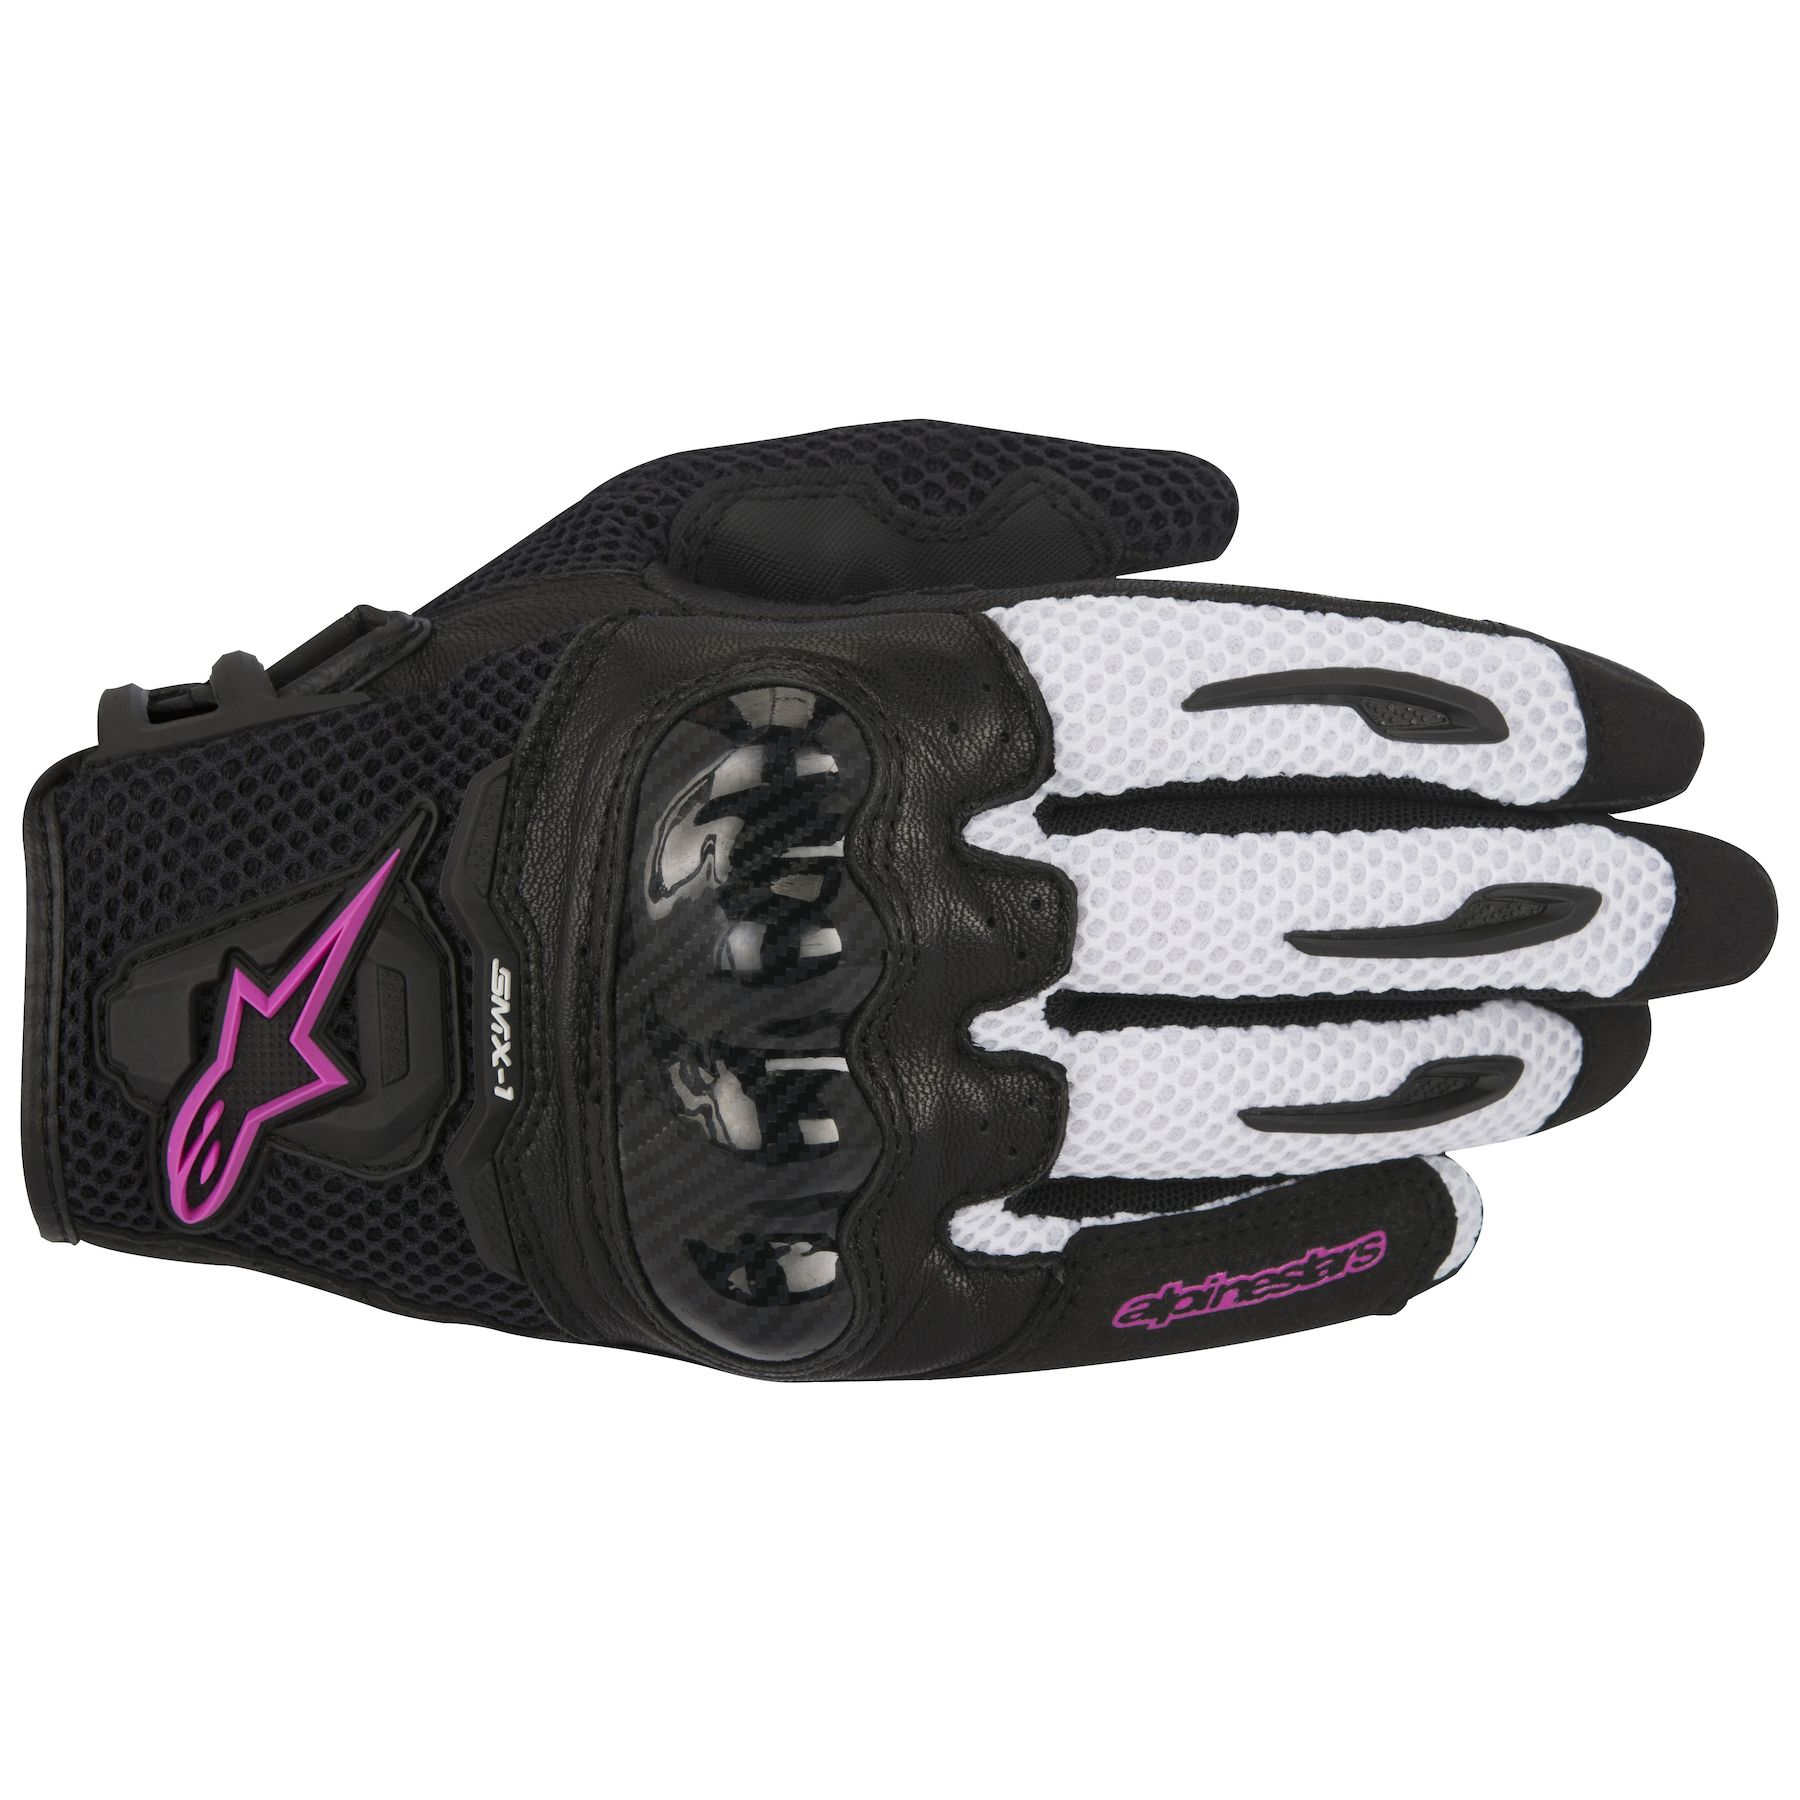 Alpinestars SMX-1 Air V2 Leather//Textile Riding Gloves Pick Size Black//Yellow